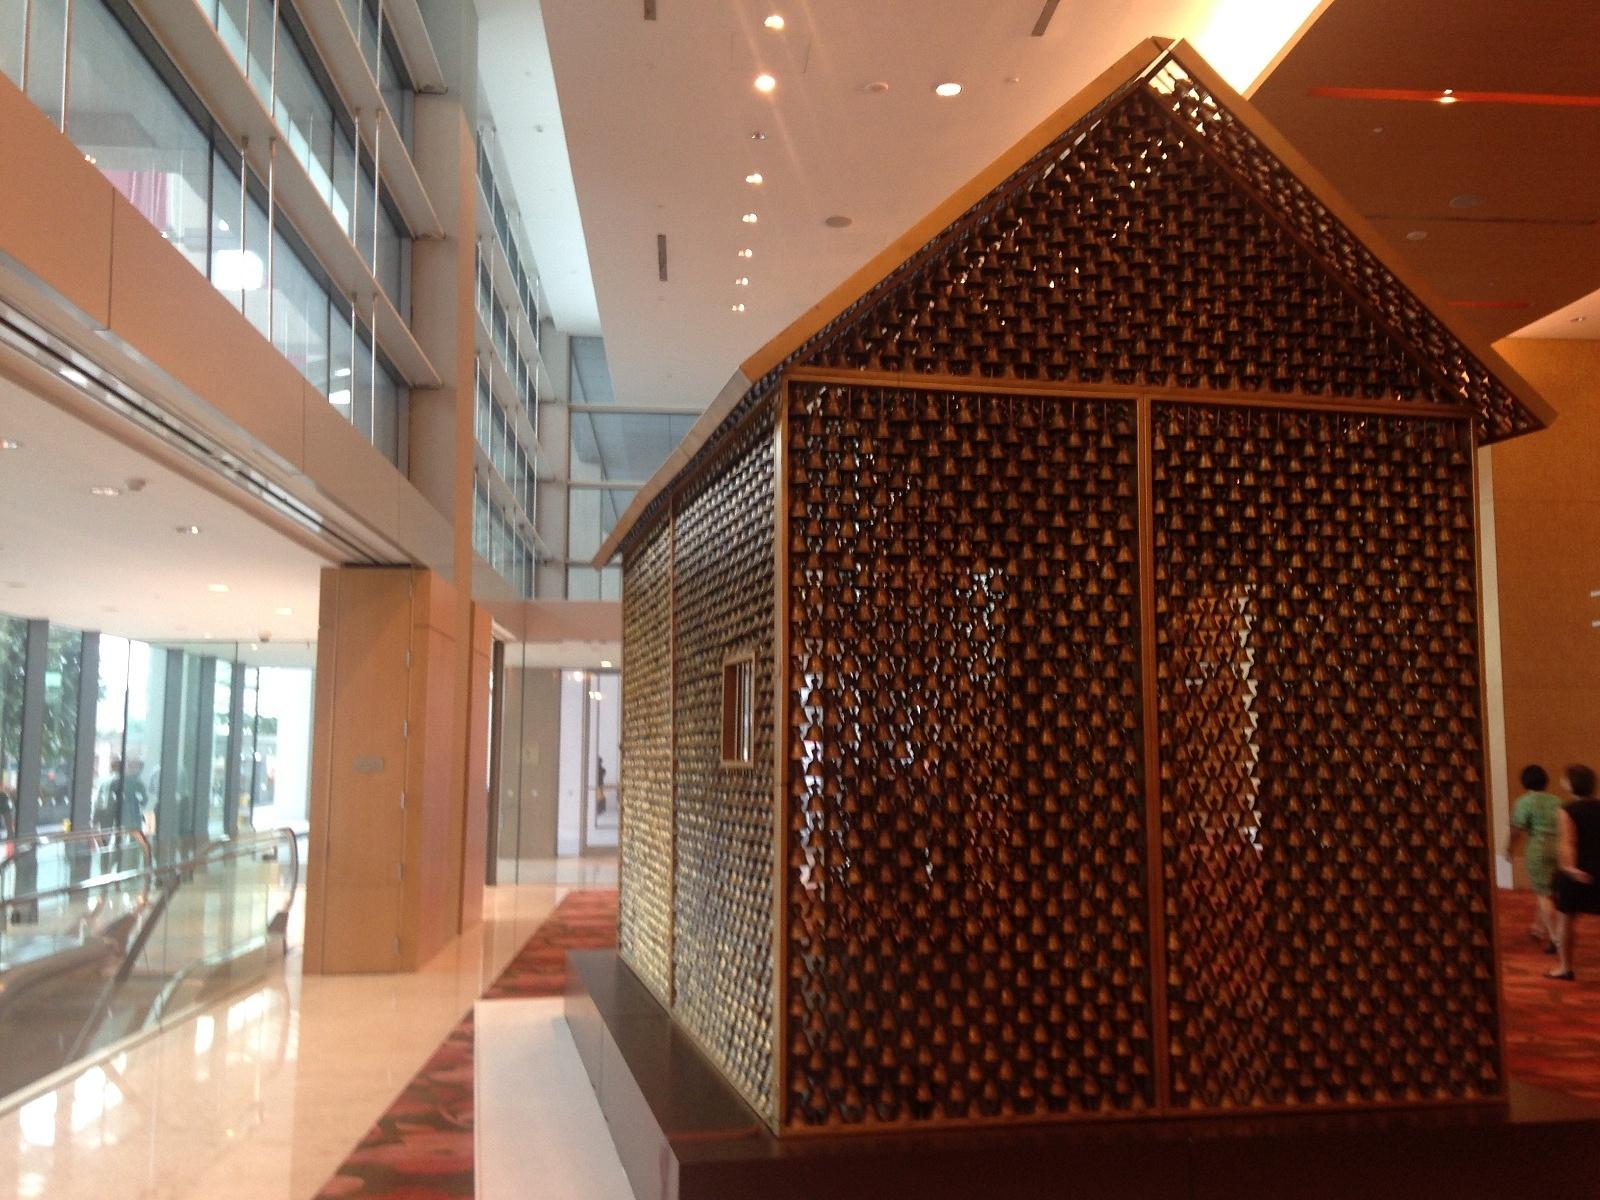 PamelaNg's Gallery